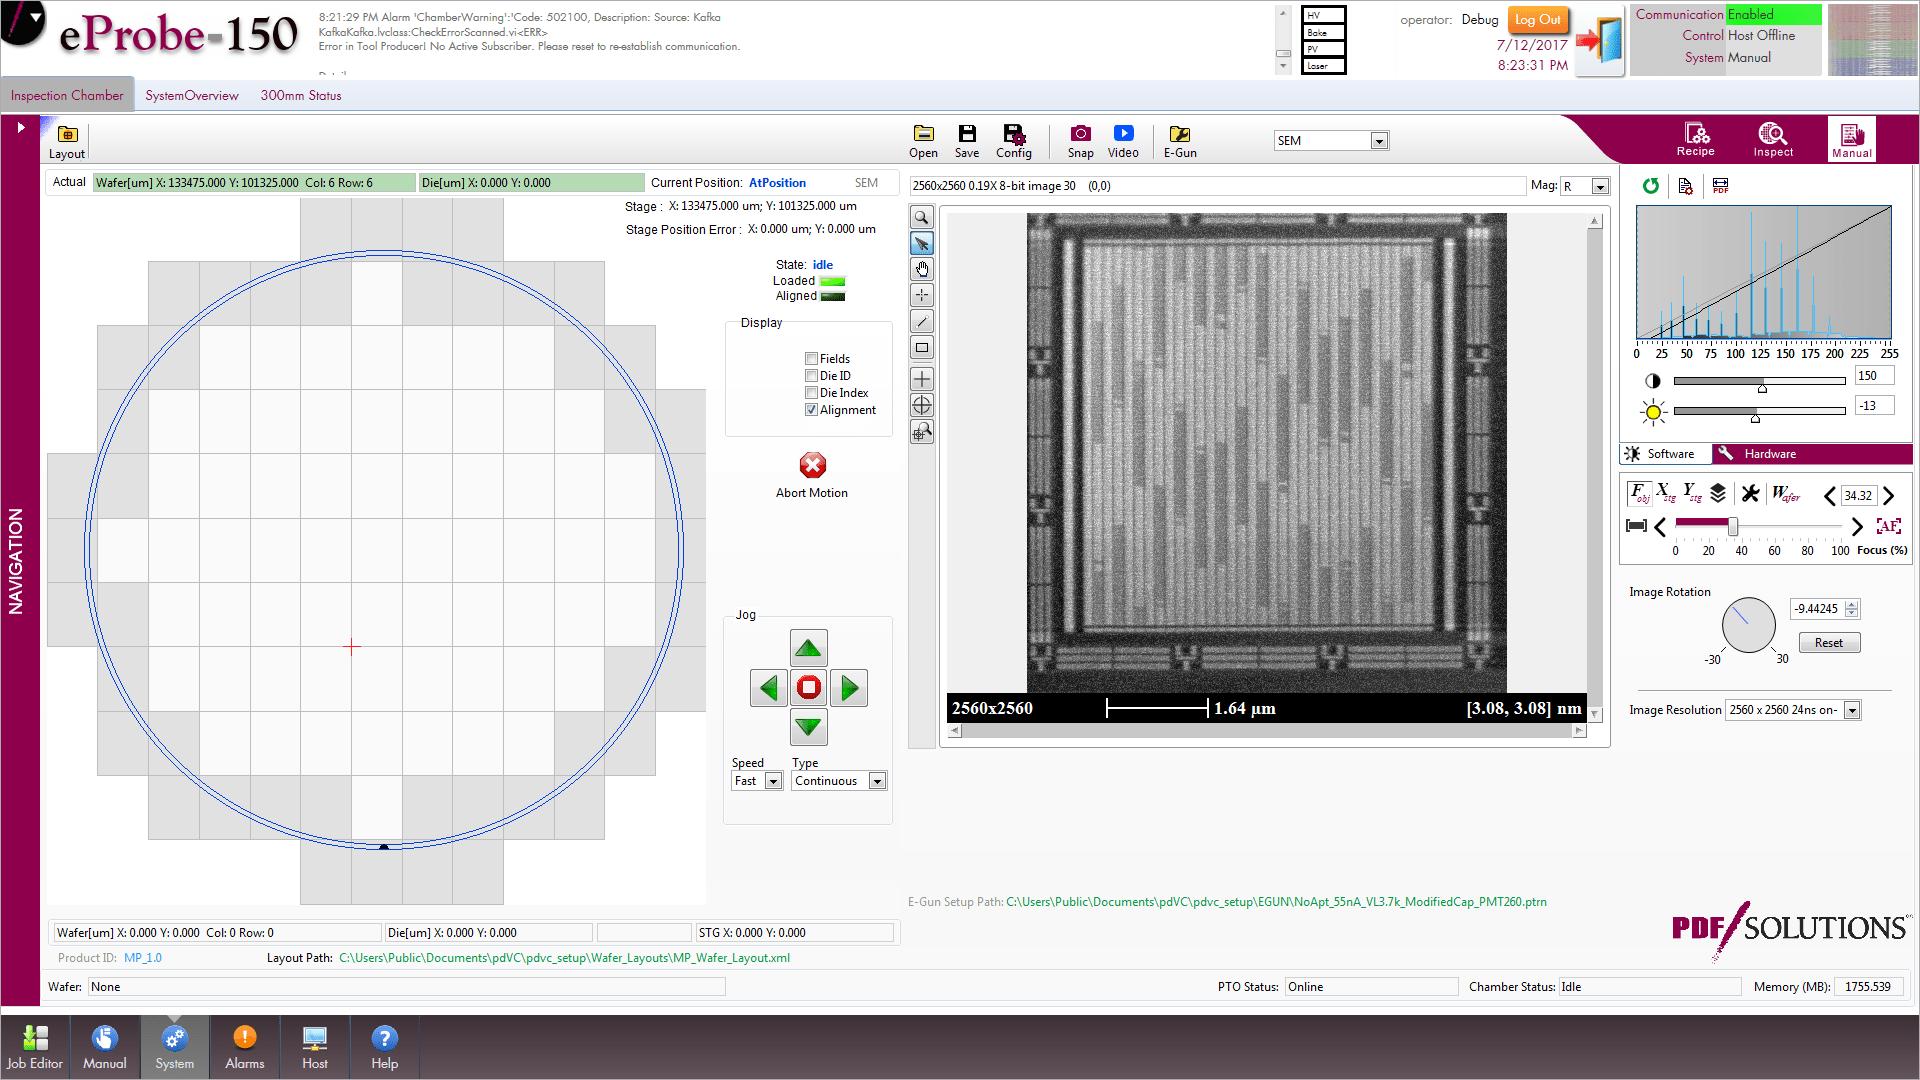 eProbe-150 user interface